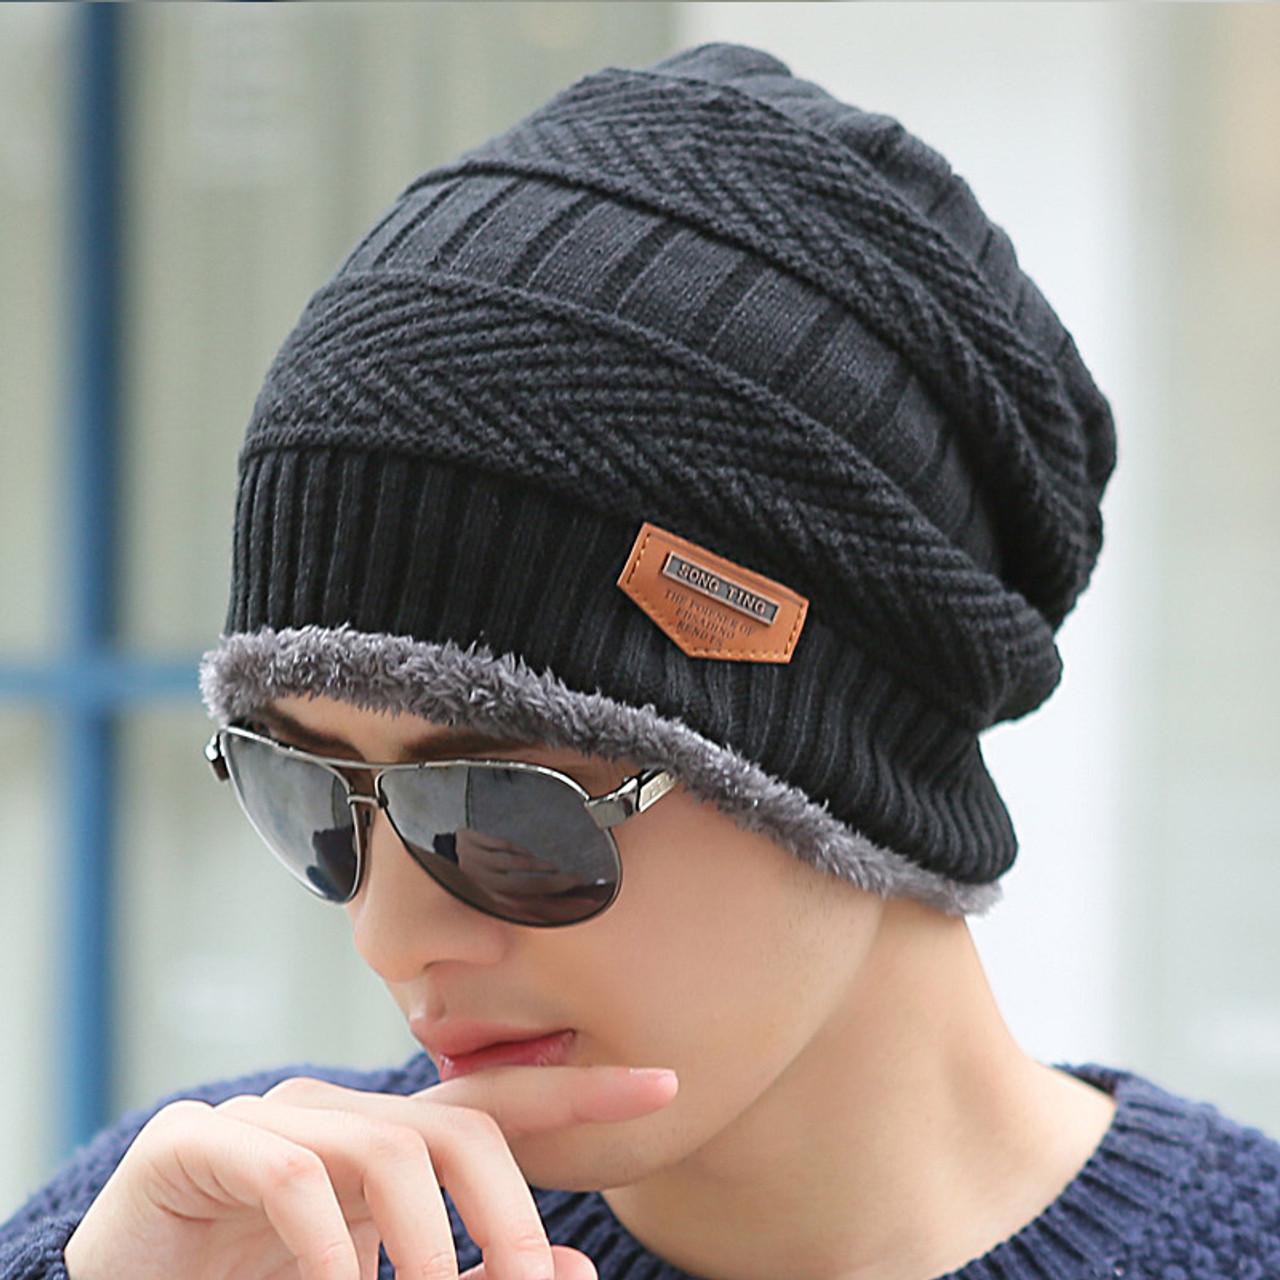 22d974de3 Boys Men Winter Hat Knit Scarf Cap Winter Hats for Men Caps Warm Fur  Skullies Beanie Bonnet Hat Man 2017 Mens Winter Hats